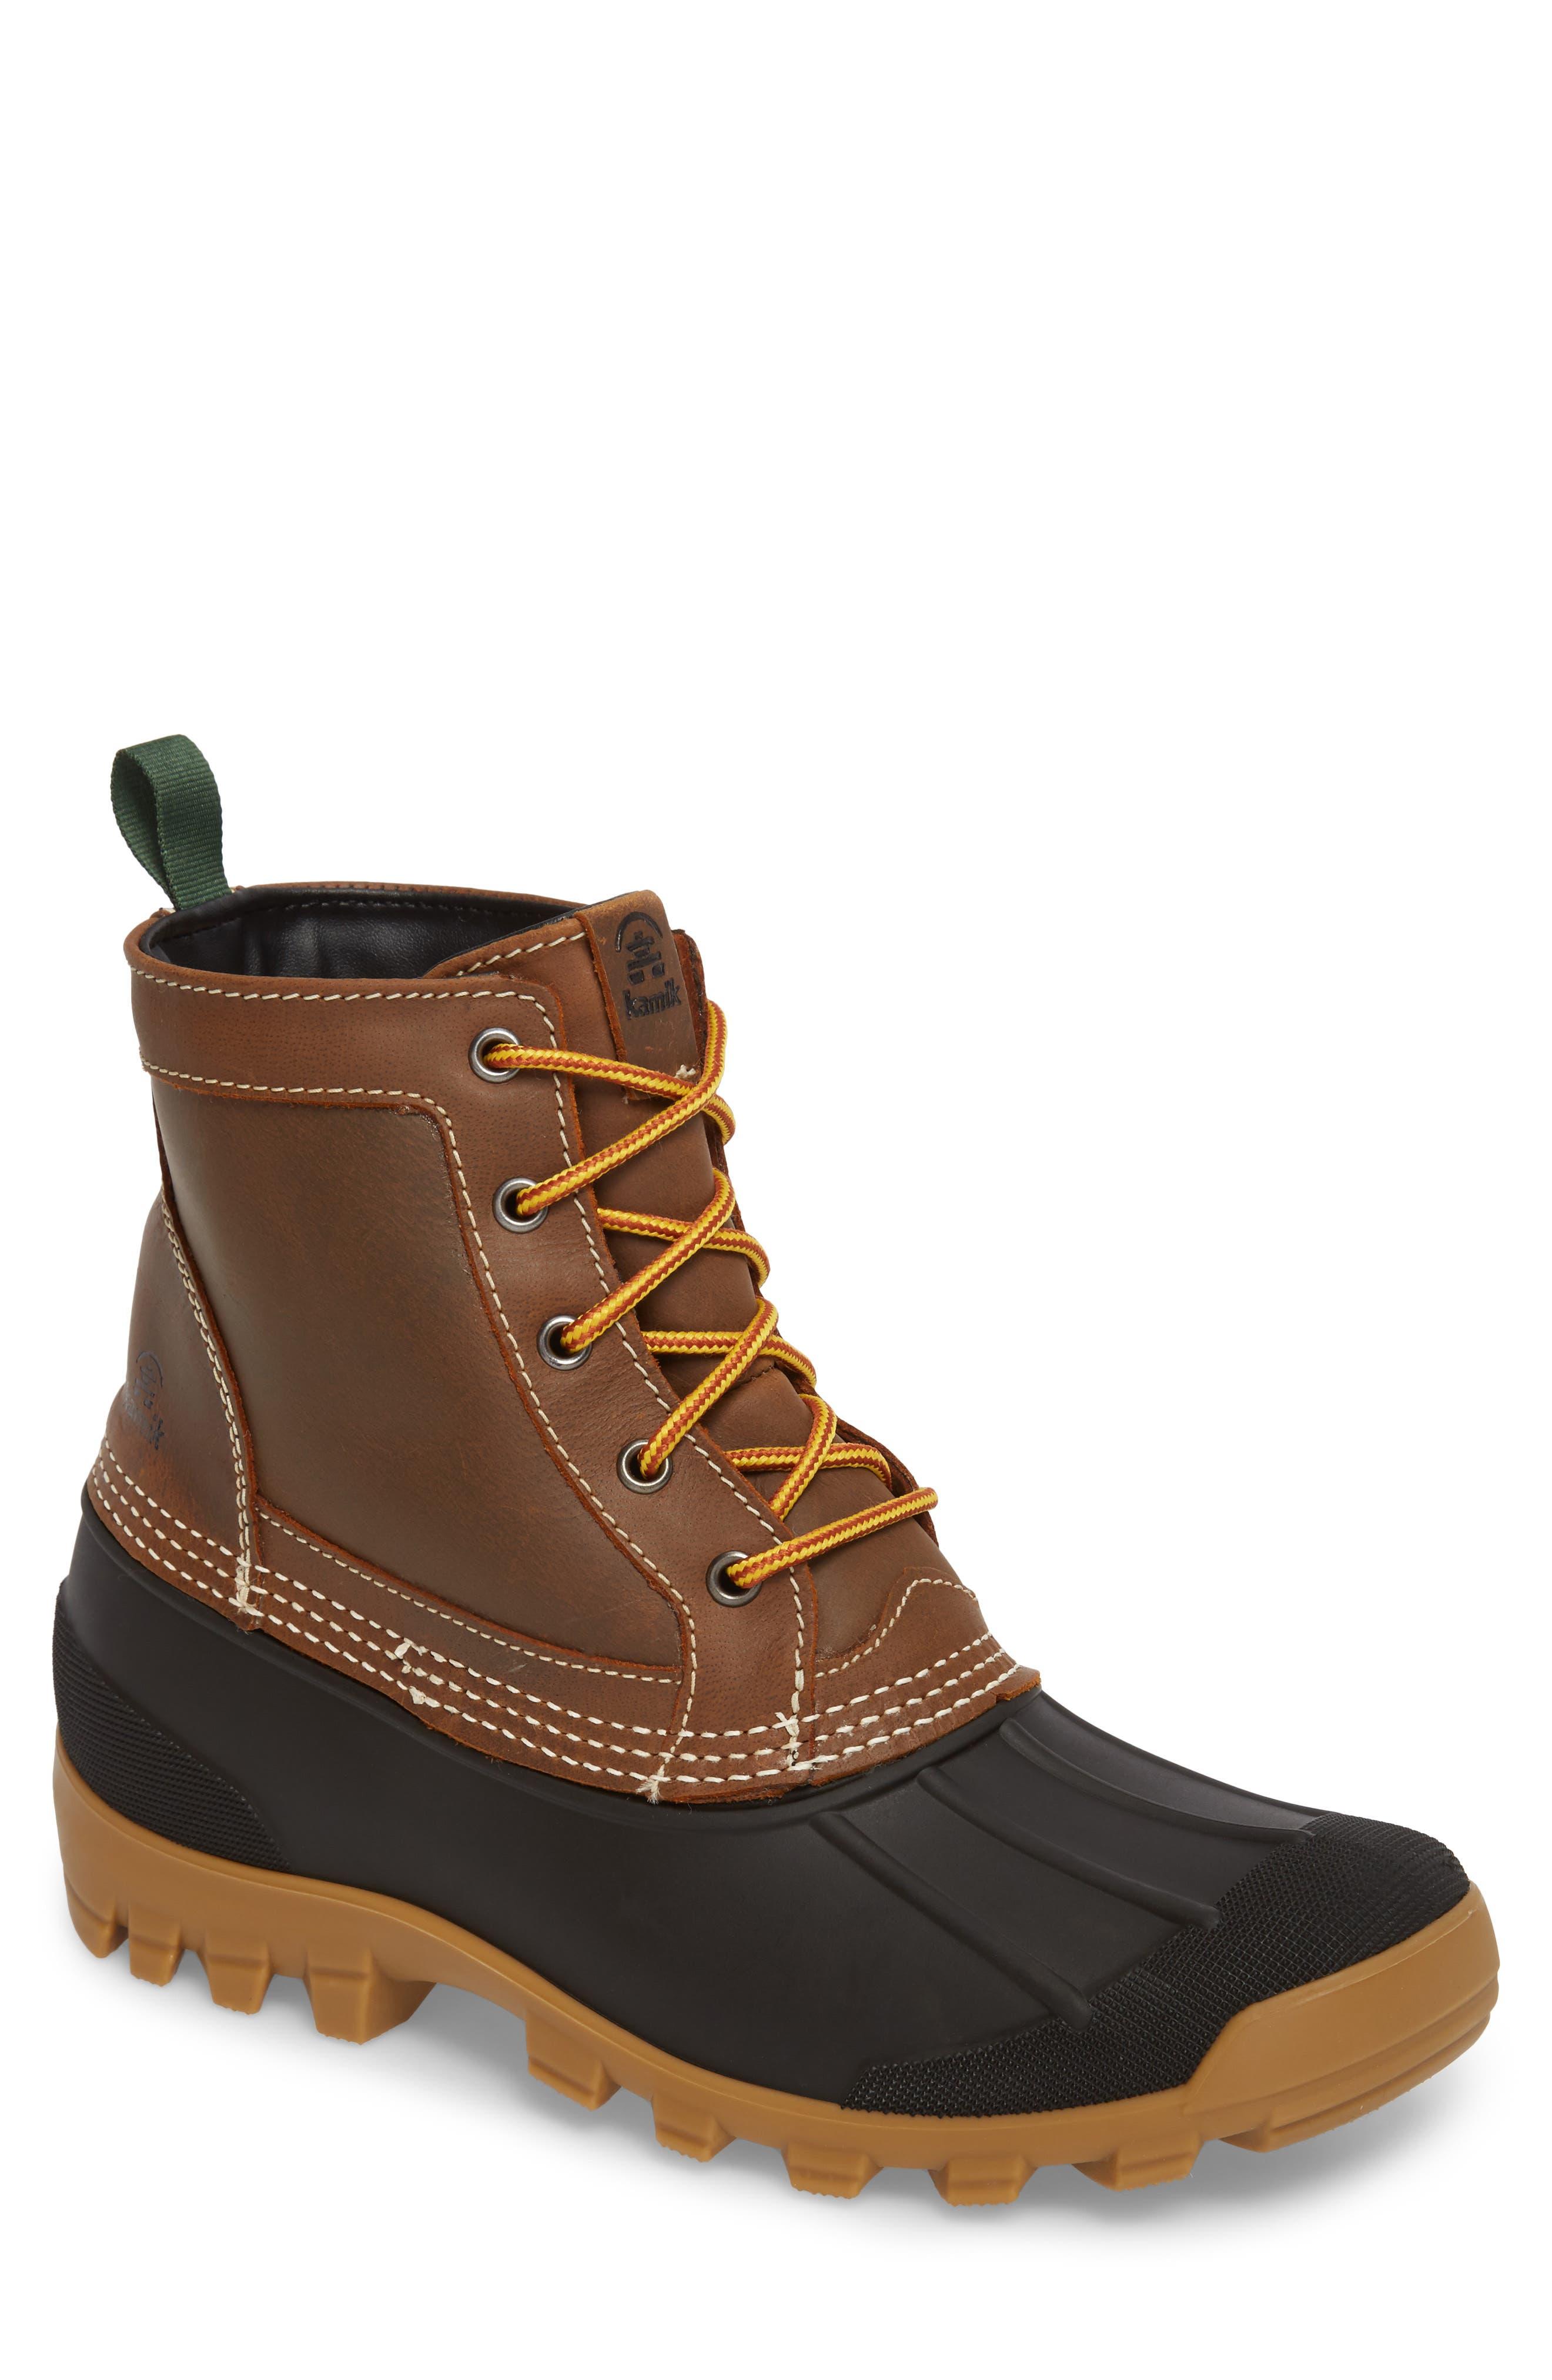 Alternate Image 1 Selected - Kamik Yukon 5 Waterproof Insulated Three-Season Boot (Men)